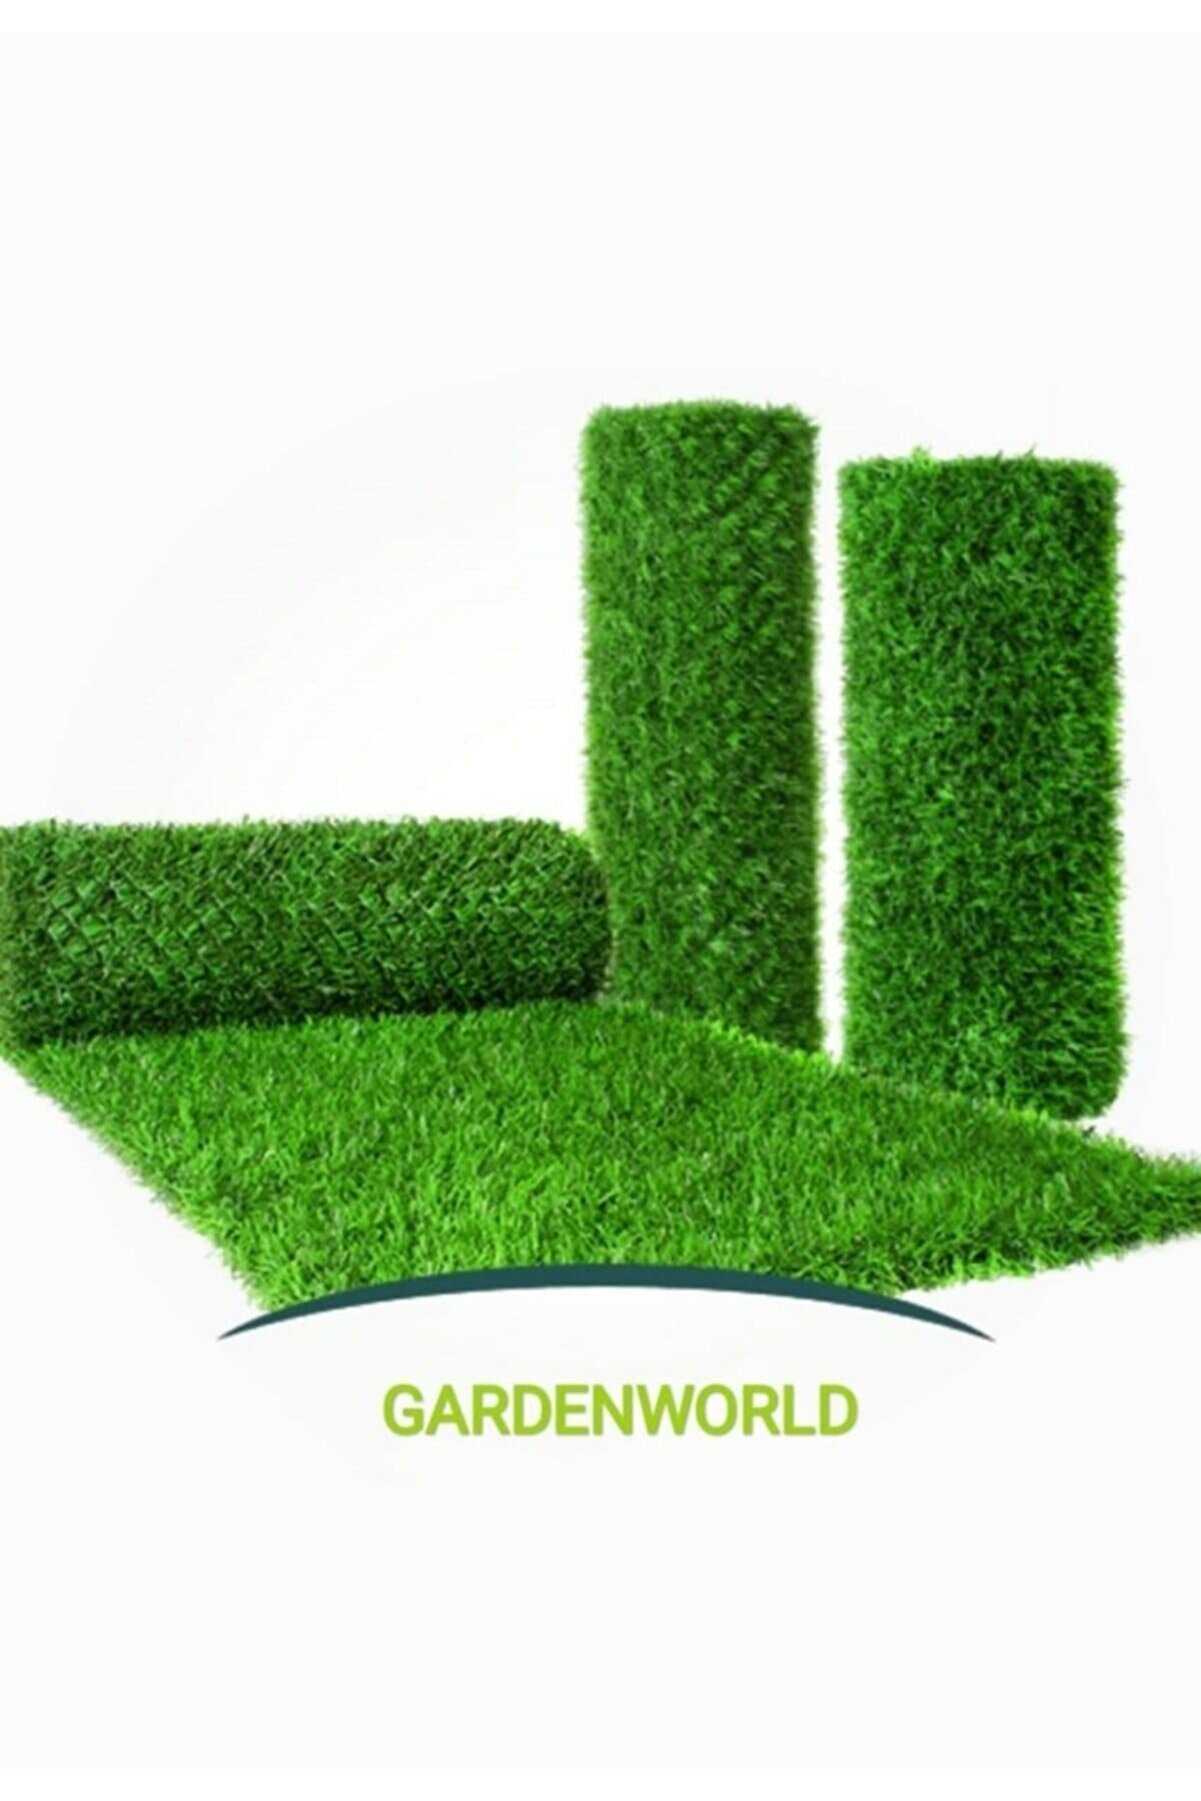 gardenworld Çim Çit Örgü Telli Bahçe Çiti 100 Cm X 5 Mt